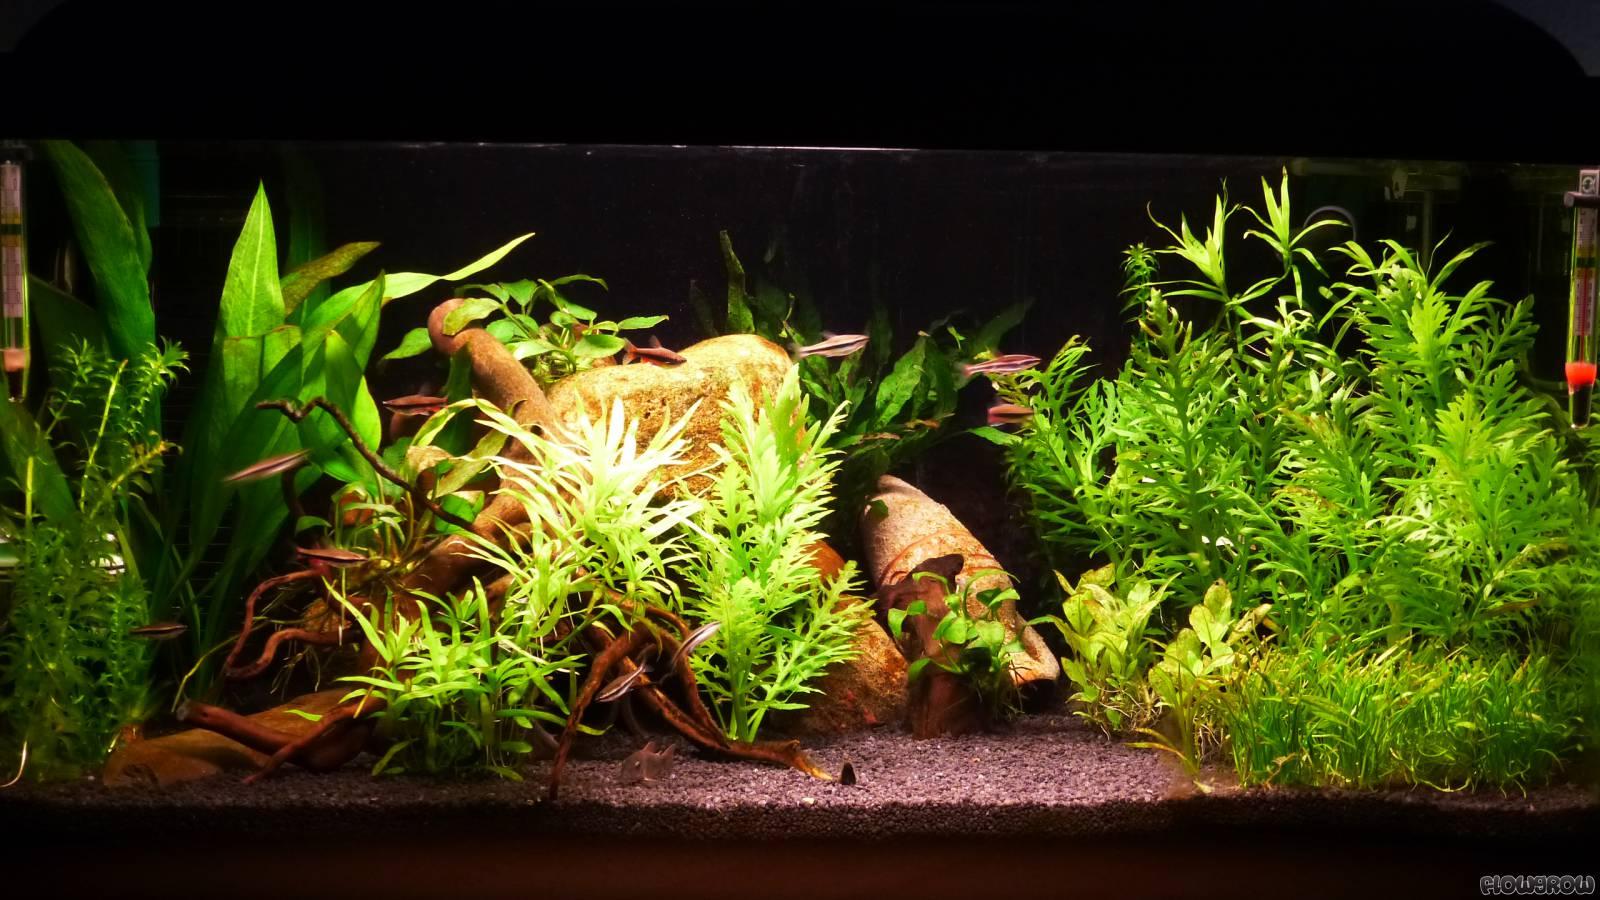 mein kleines aquarium flowgrow aquascape aquarien datenbank. Black Bedroom Furniture Sets. Home Design Ideas